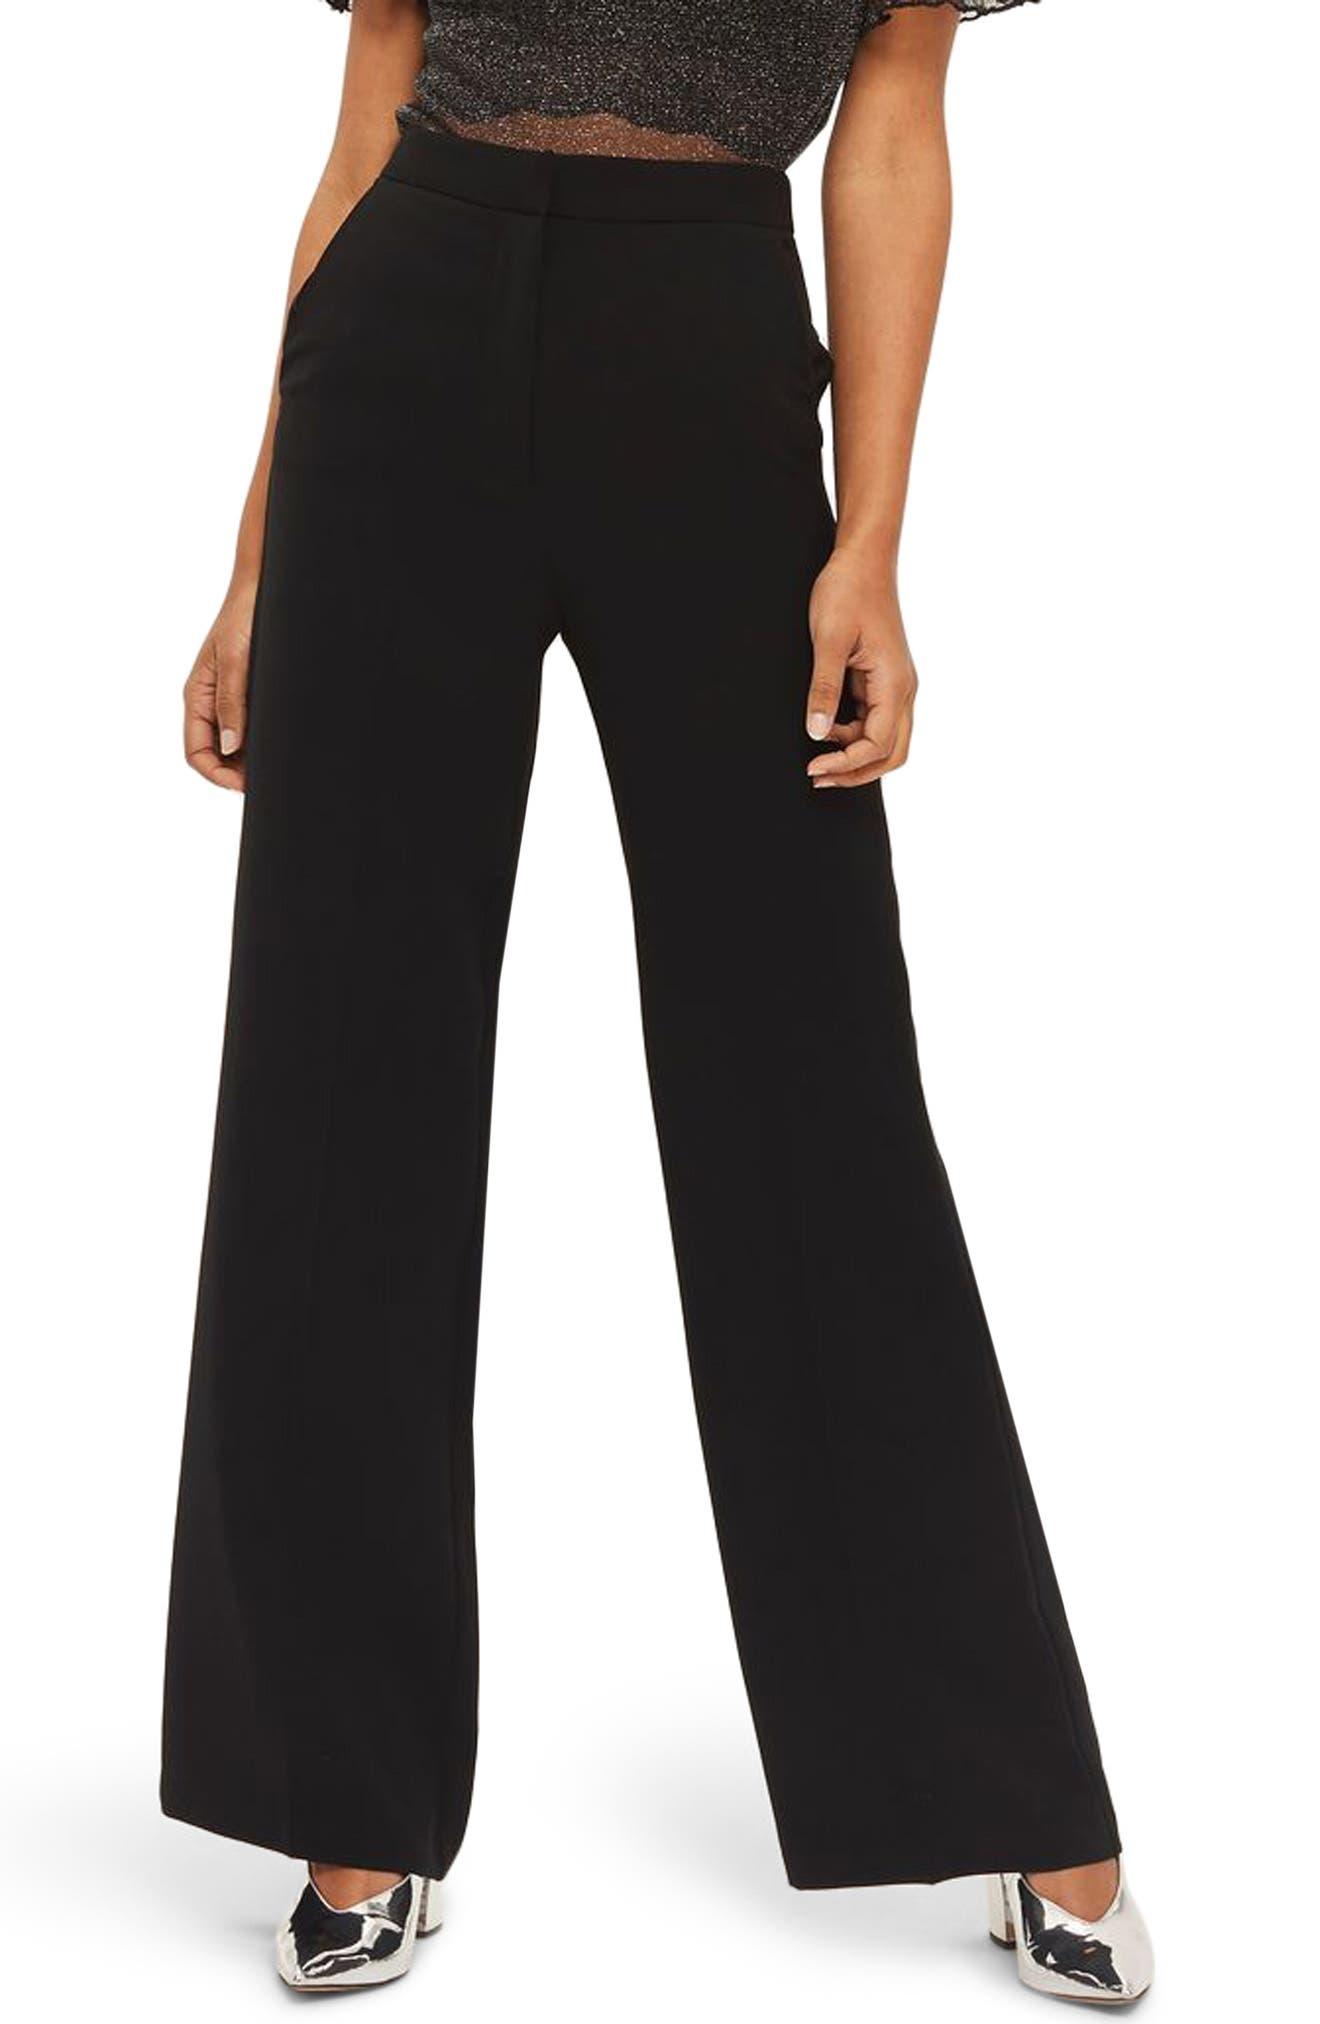 Main Image - Topshop High Waist Wide Leg Trousers